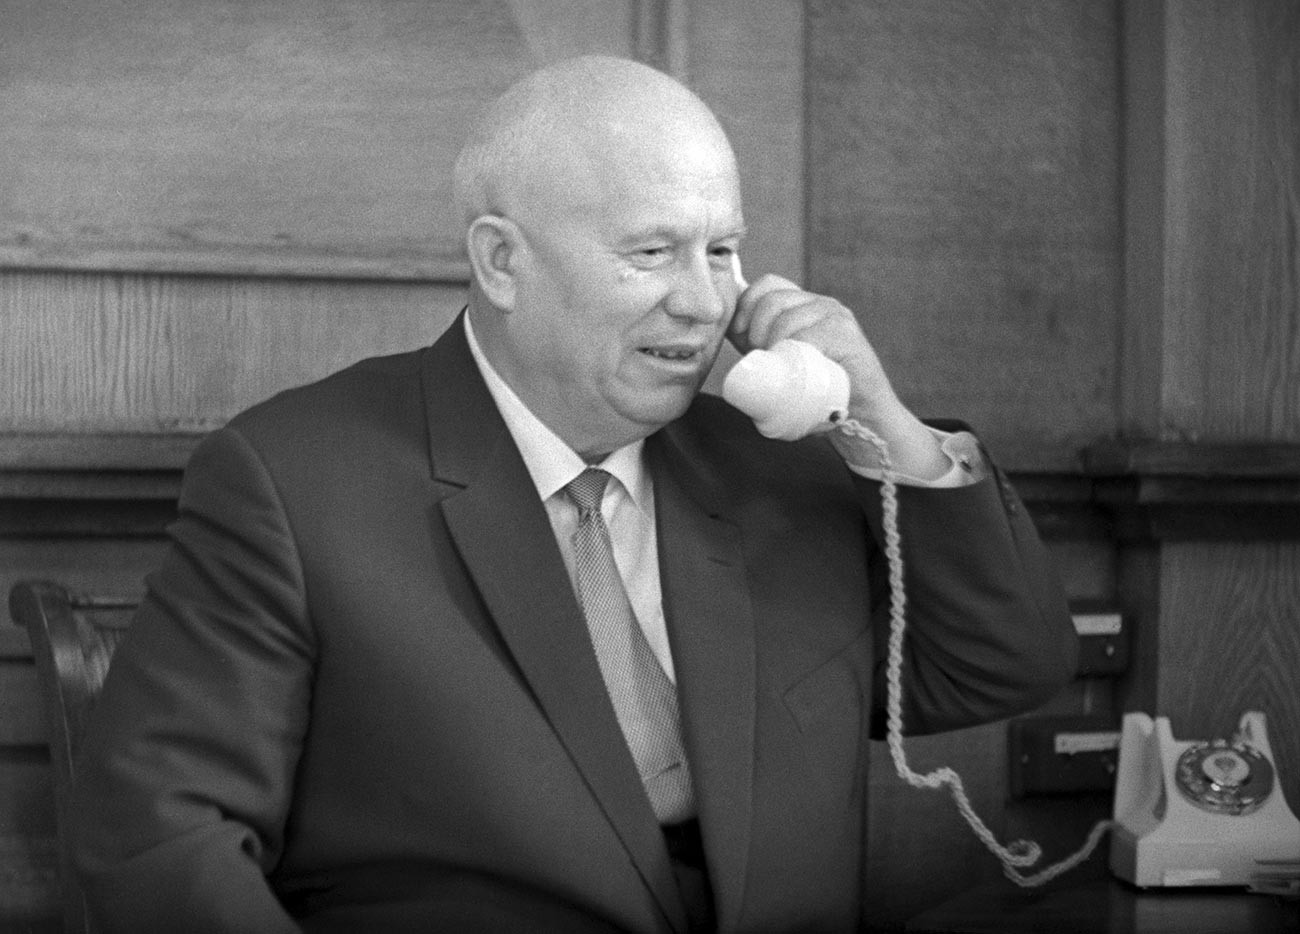 Moskva, Kremlj. Prvi sekretar CK KPSS-a Nikita Hruščov u svom radnom kabinetu.